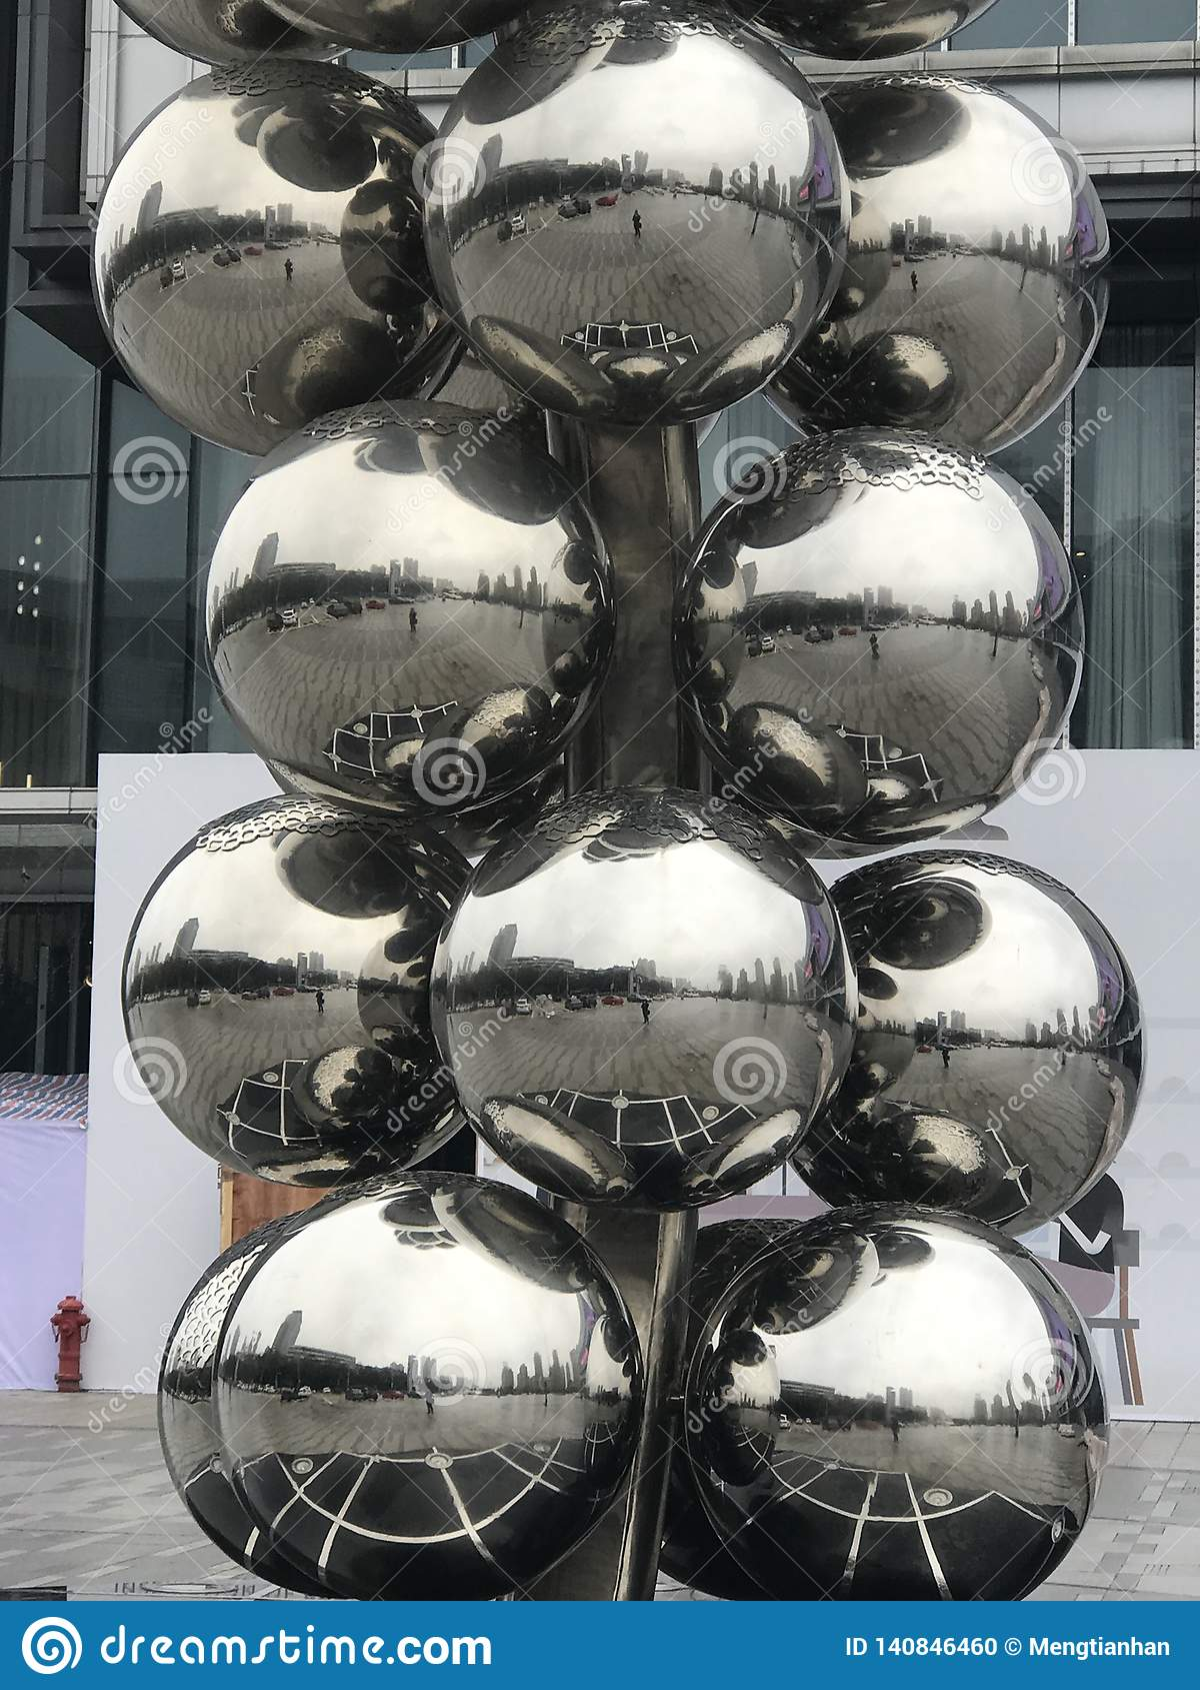 Stainless steel ball sculpture decoration